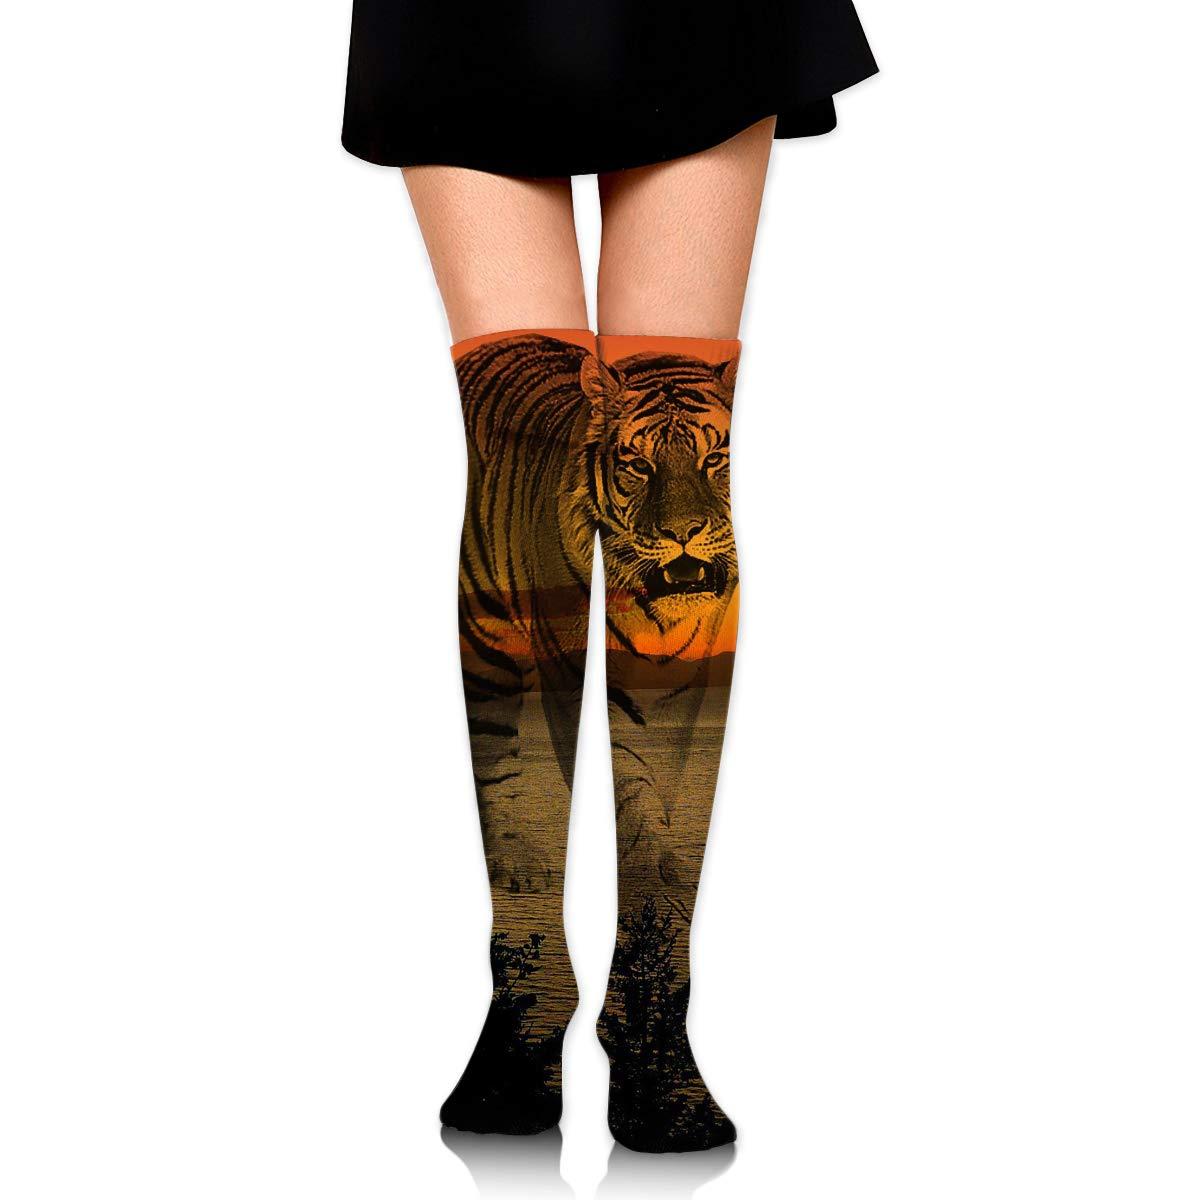 High Elasticity Girl Cotton Knee High Socks Uniform Sunsets Fantasy Lake Tiger Women Tube Socks